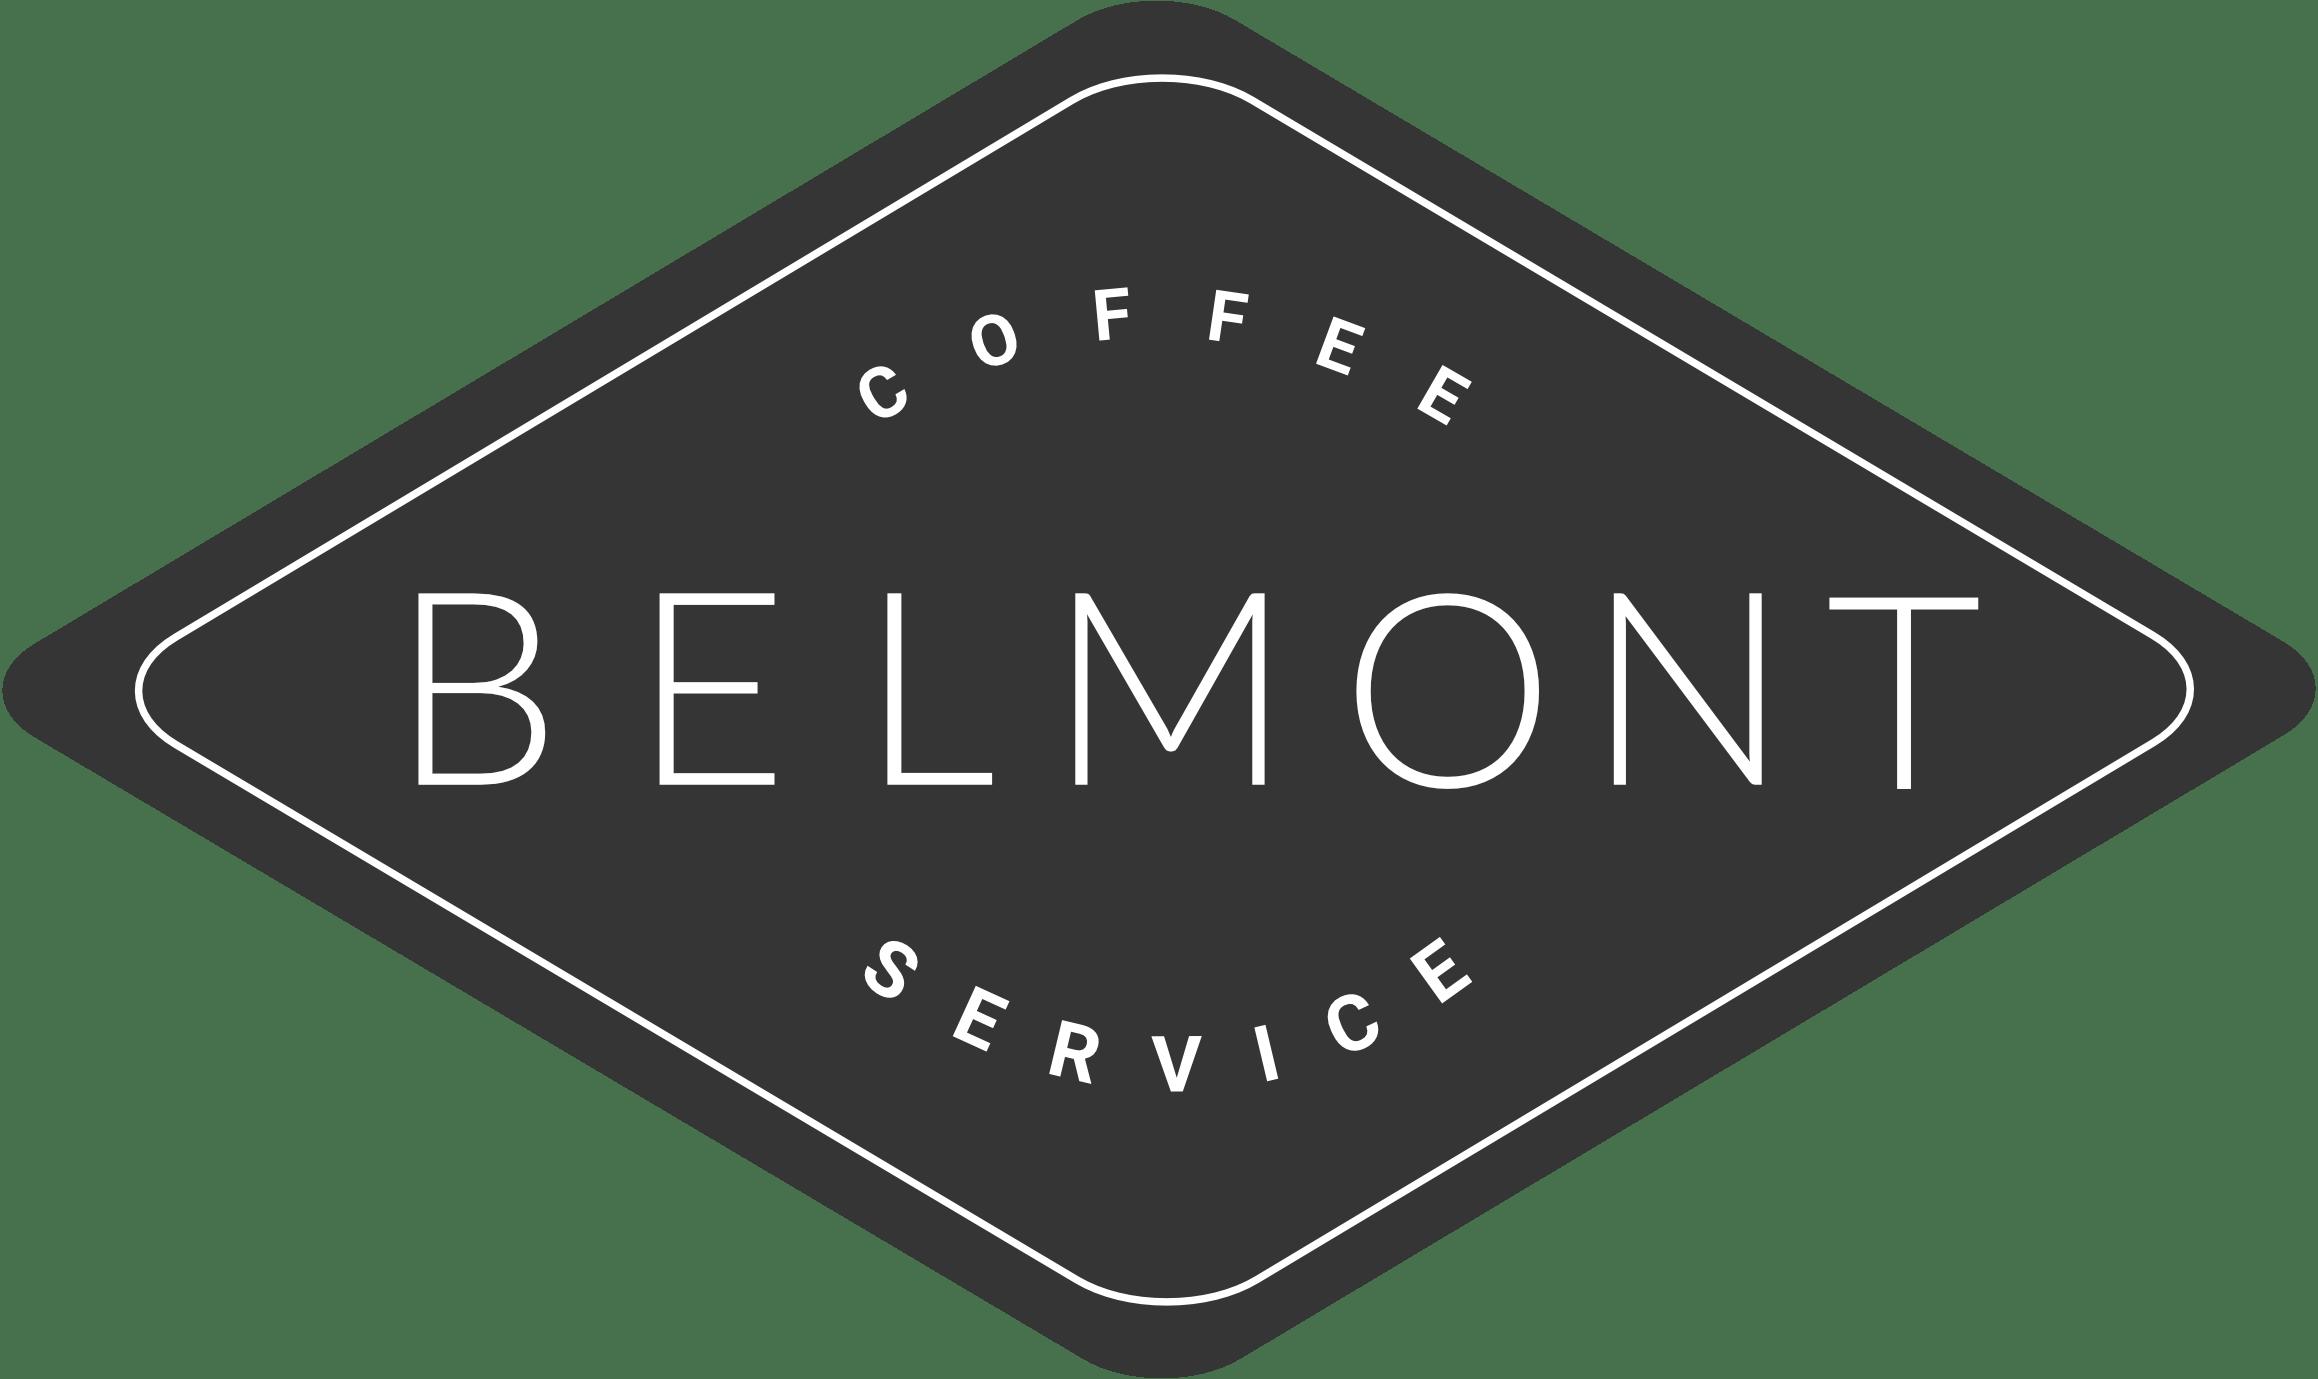 Belmont Coffee Service